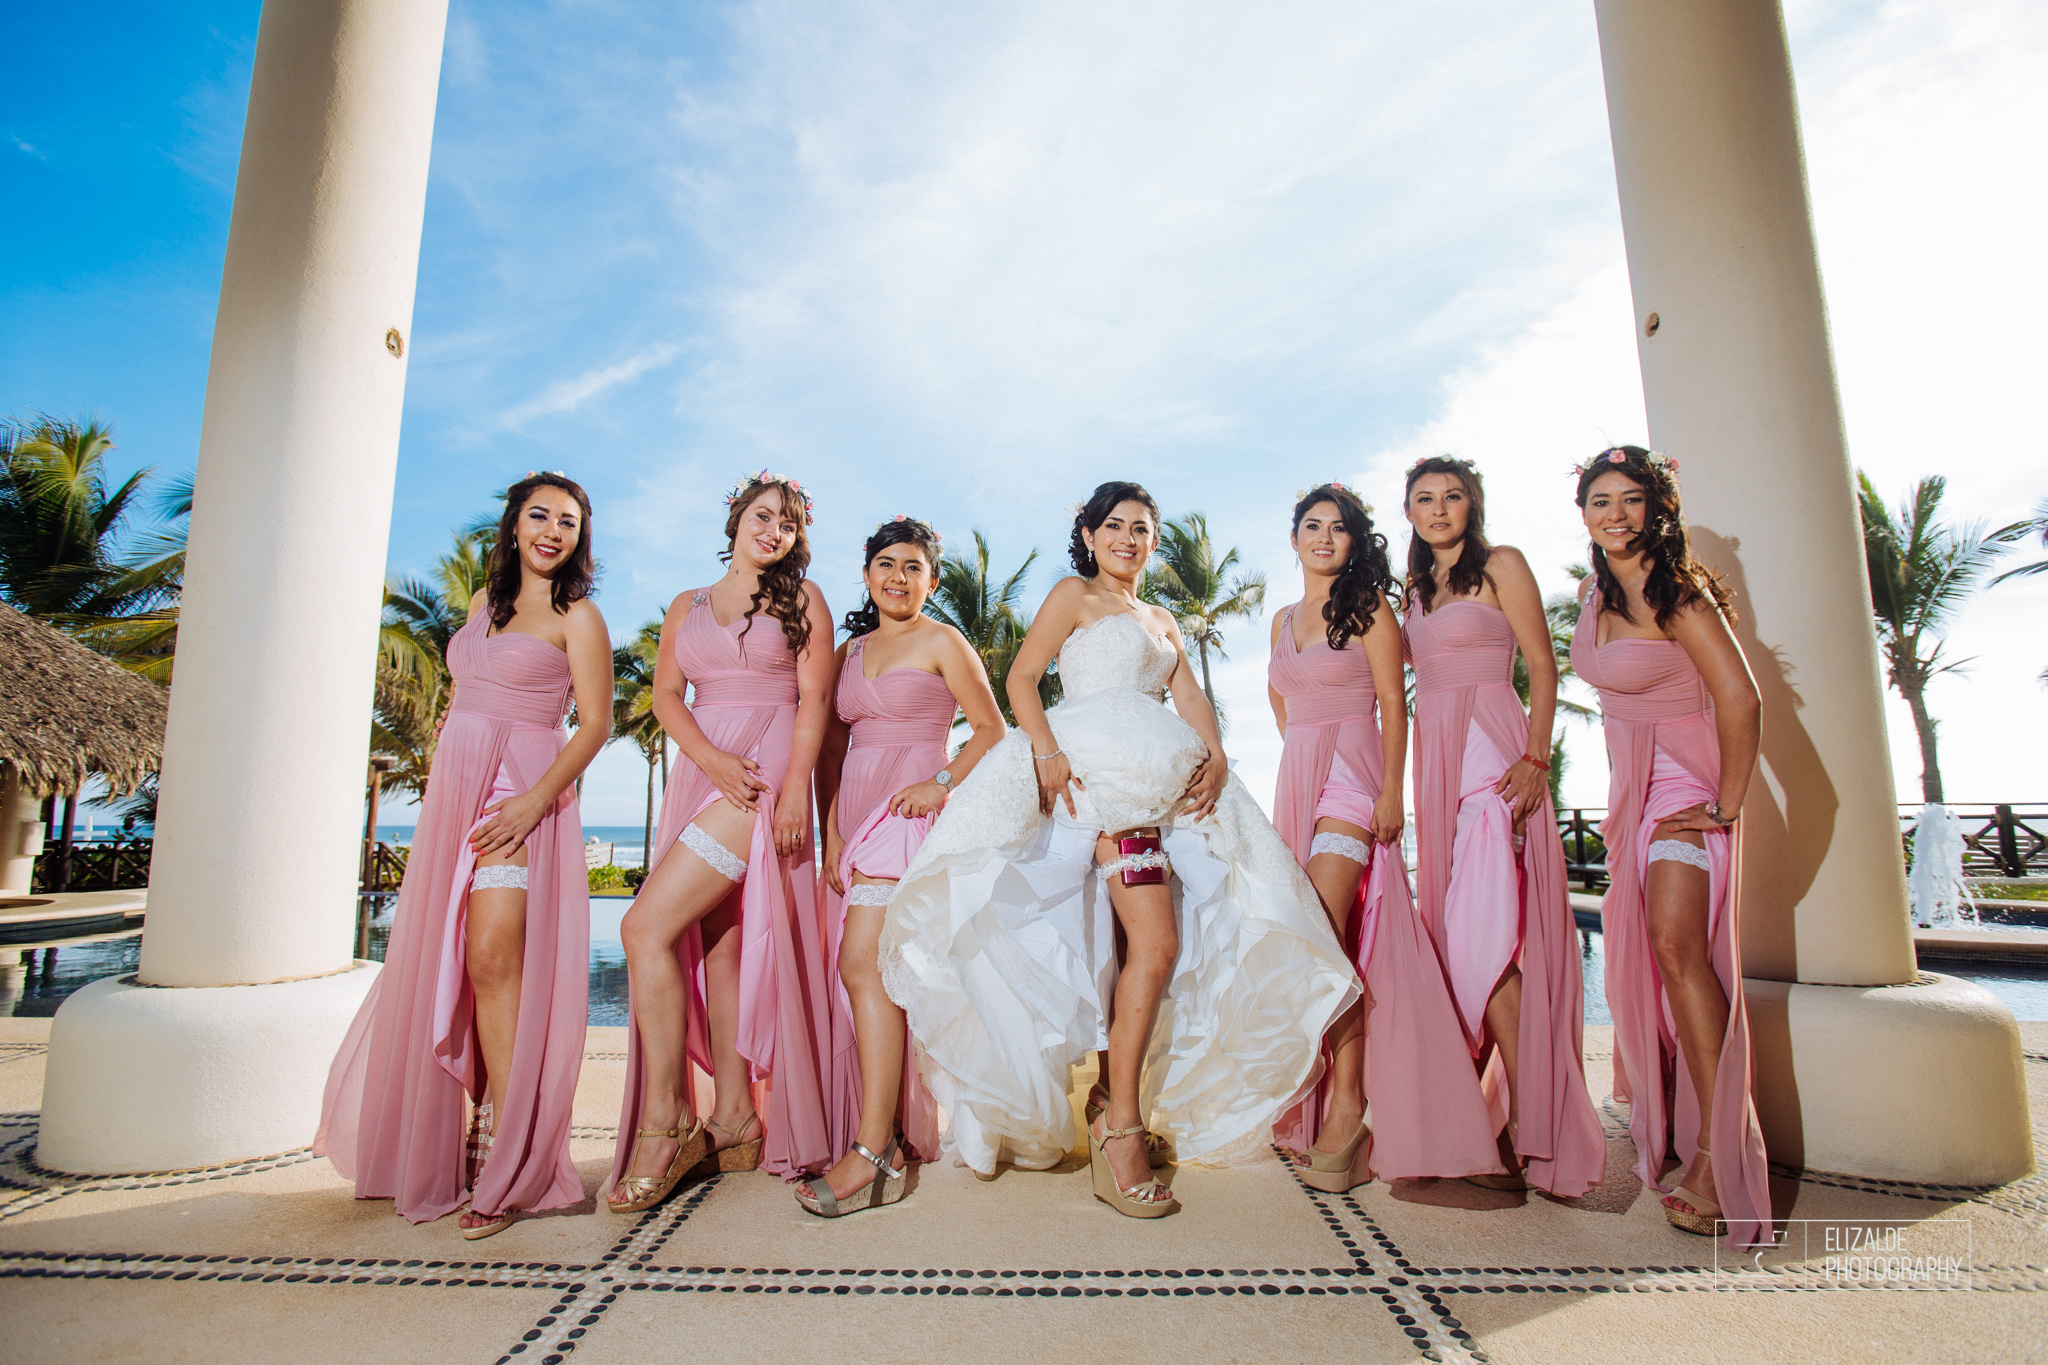 Pay and Ferran_Acapulco_Destination Wedding_Elizalde Photography-55.jpg